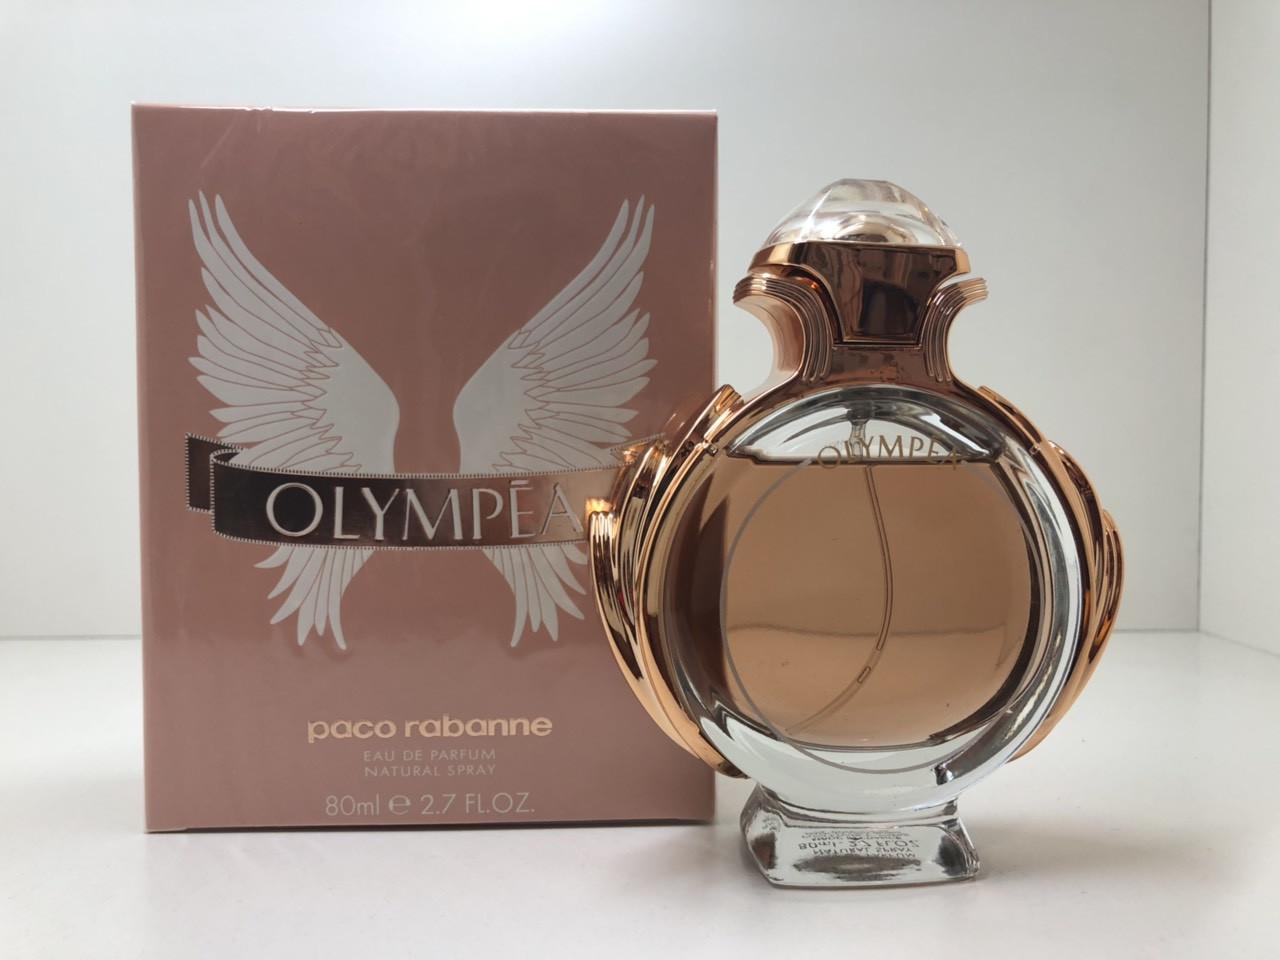 Жіноча парфумована вода Paco Rabanne Olympea (Пако Рабан Олимпея) 80 мл